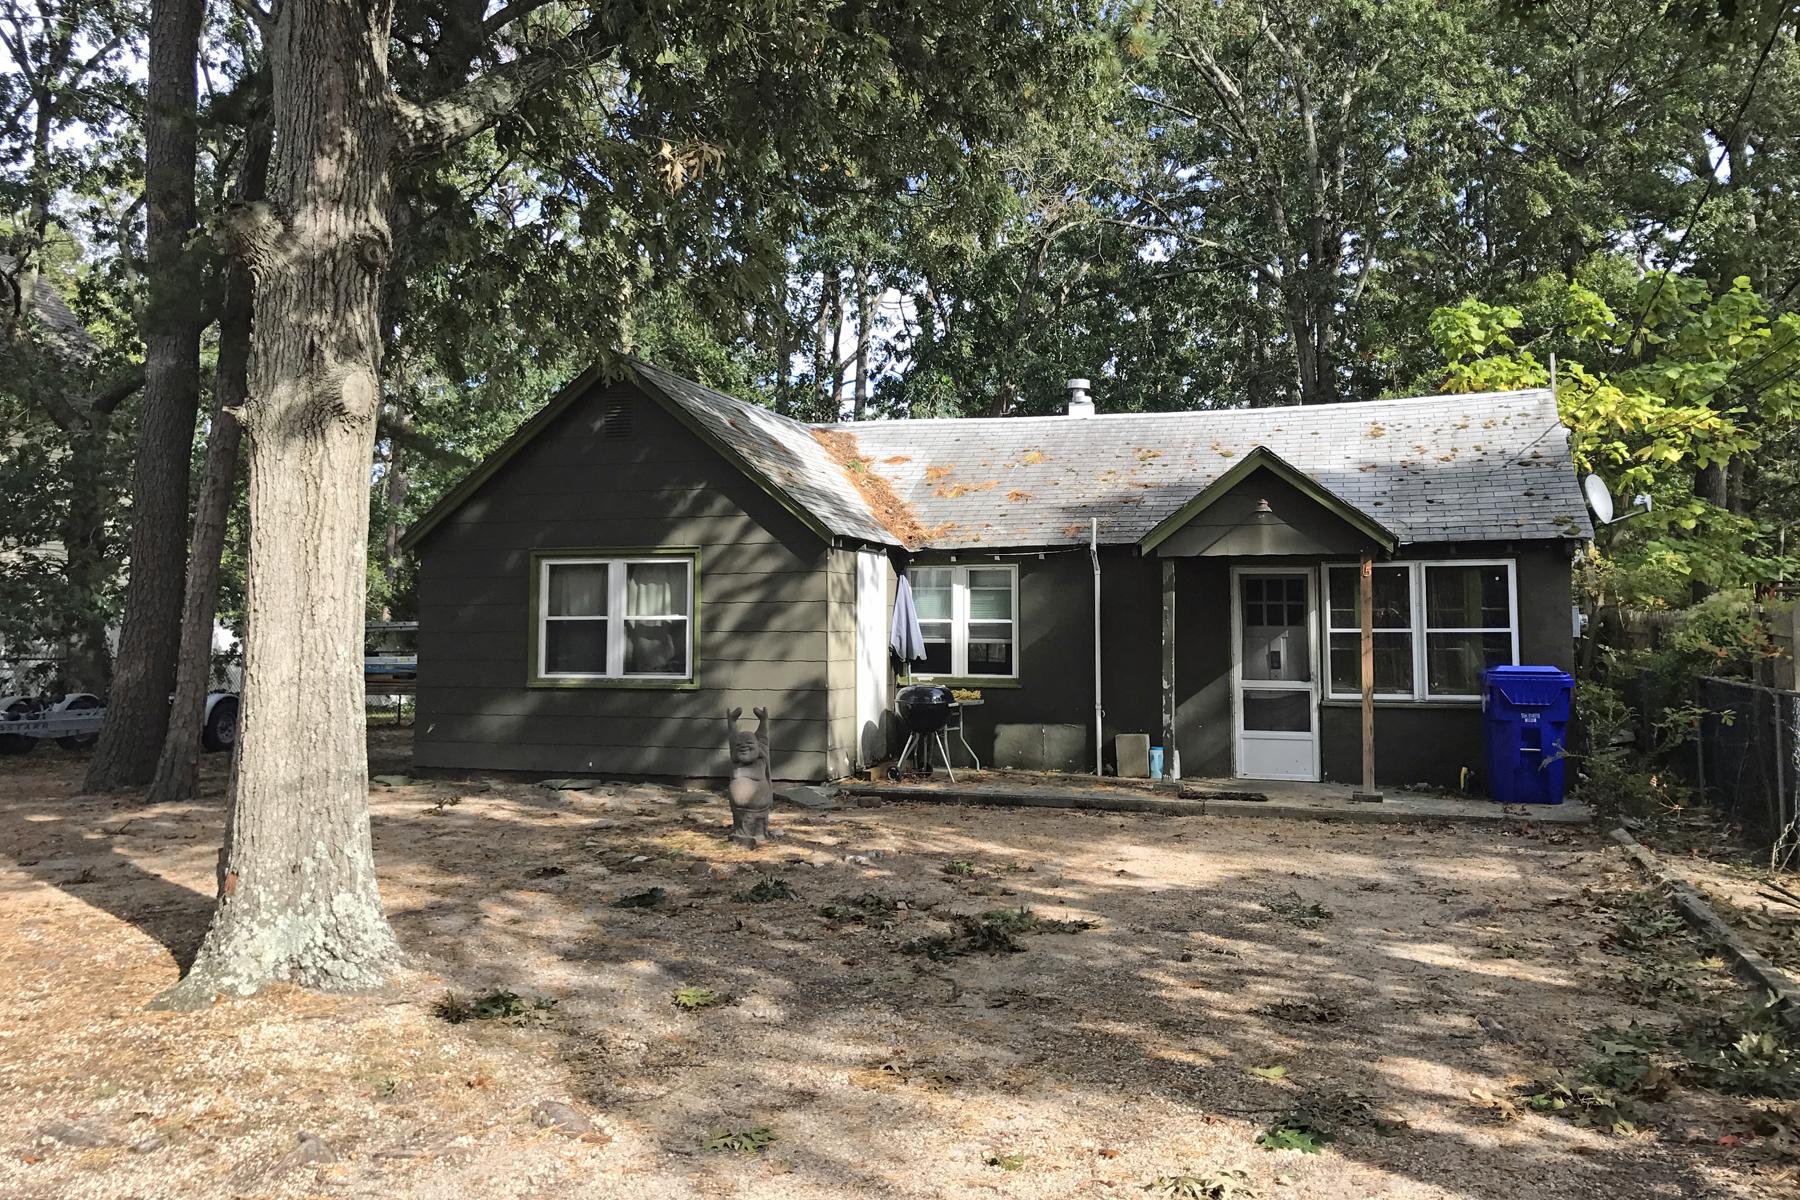 Single Family Homes für Verkauf beim Located On Large Lot On Dead End Street 15 N Raleigh Rd, Brick, New Jersey 08723 Vereinigte Staaten